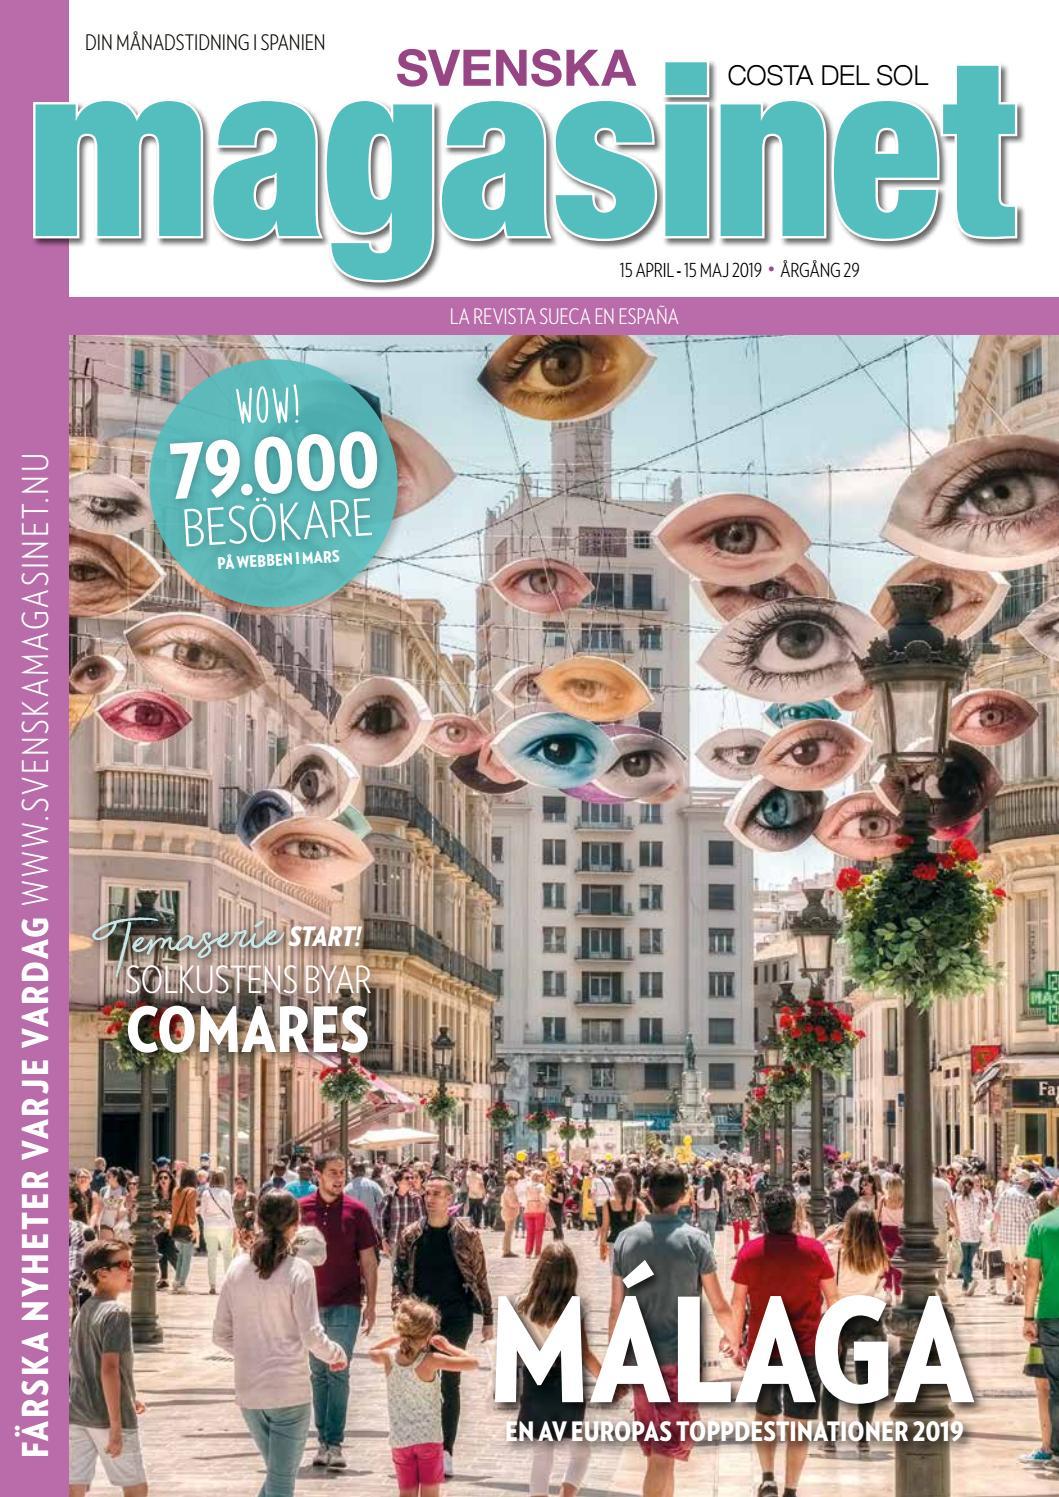 Bancone Bar Per Casa april_2019 by svenska magasinet, spanien - issuu